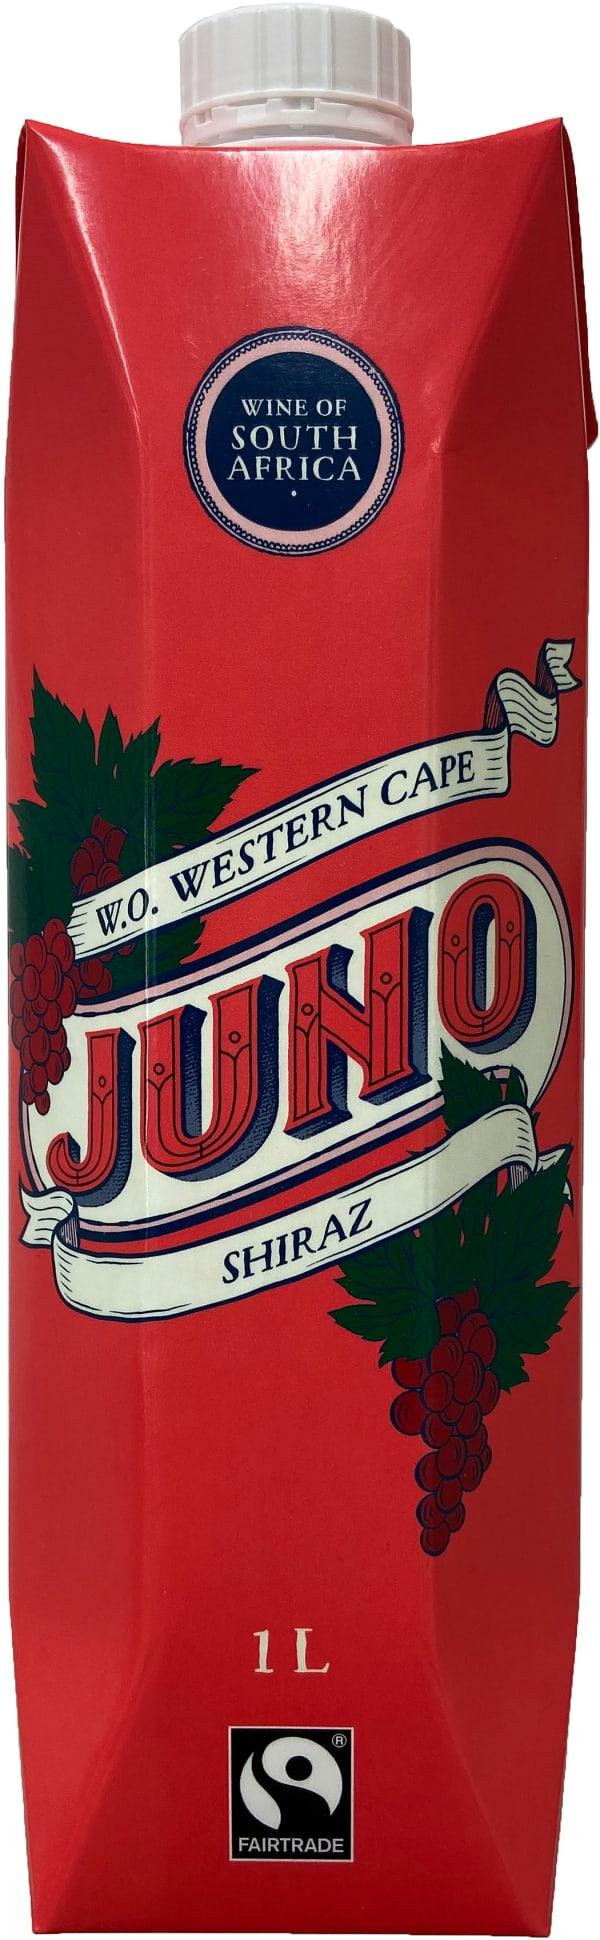 Juno Shiraz 2020 kartongförpackning